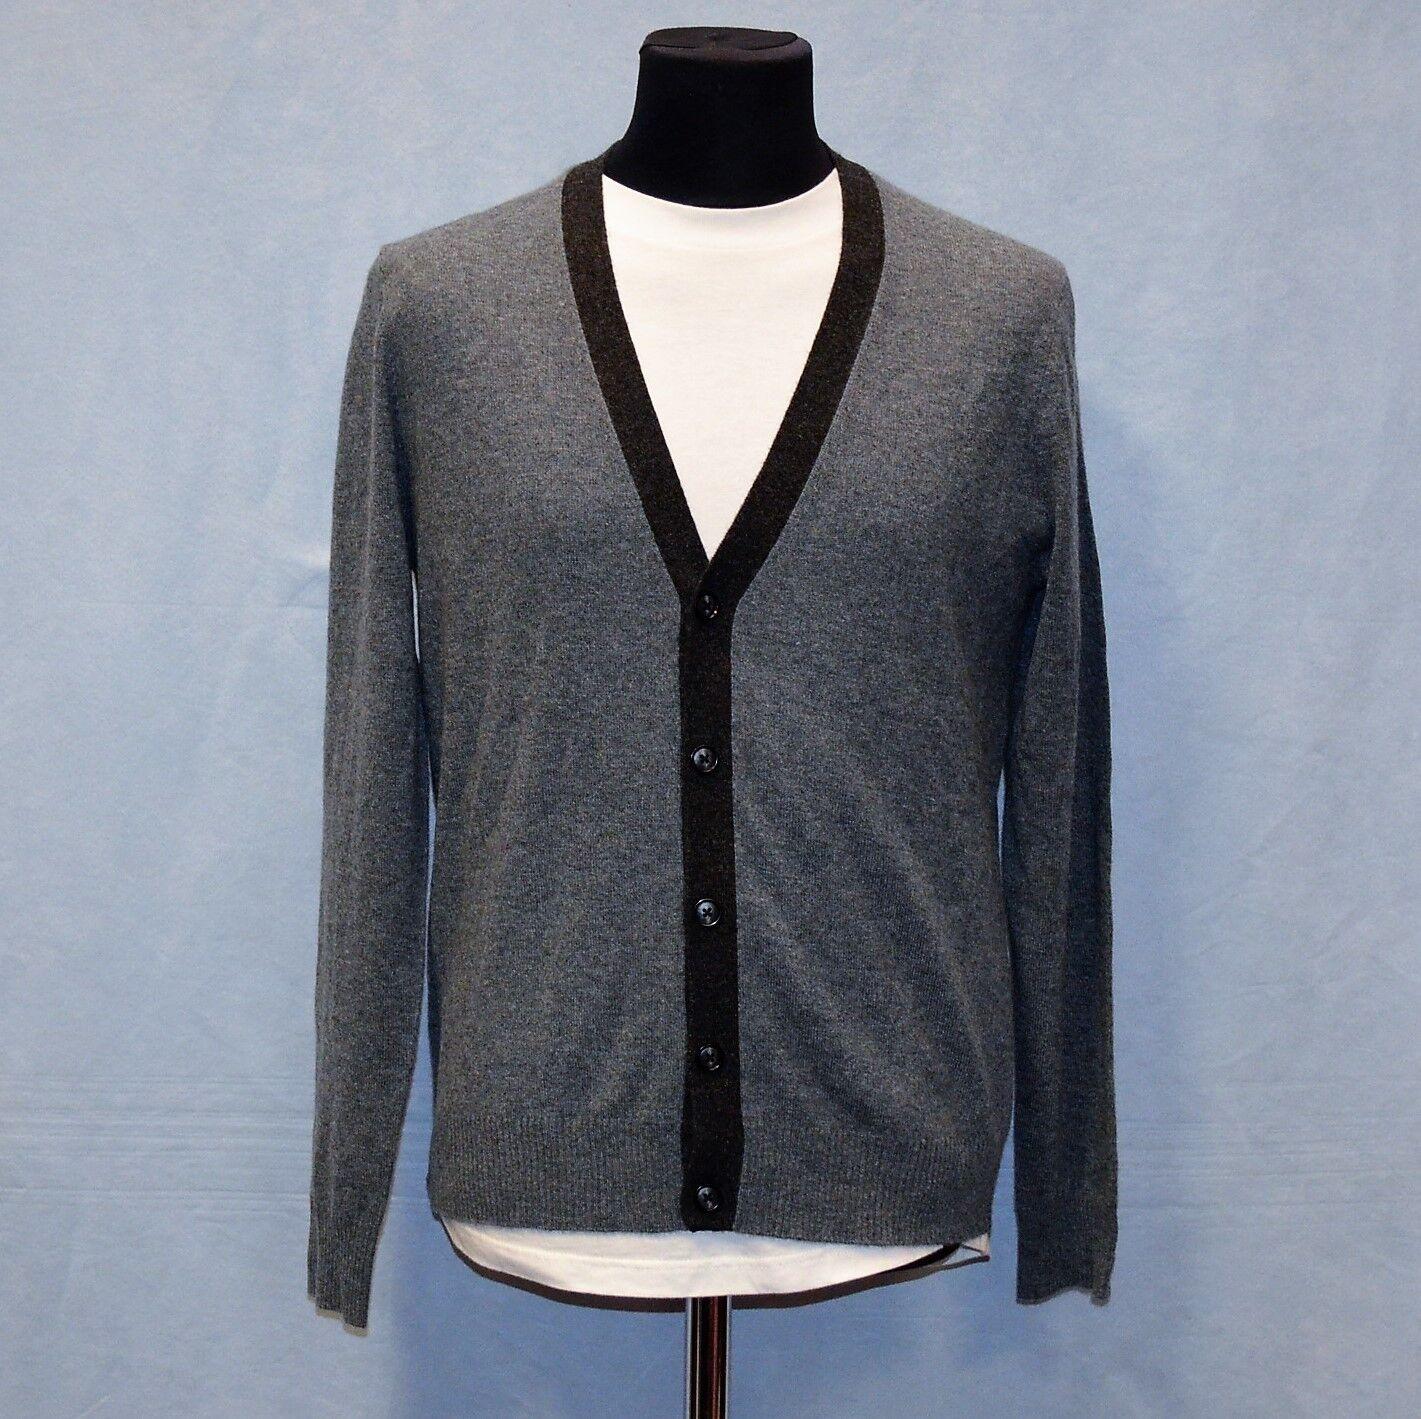 B5 NWT NEIMAN MARCUS Cashmere ContrastTrim Iron Heather Cardigan Sweater XL 368